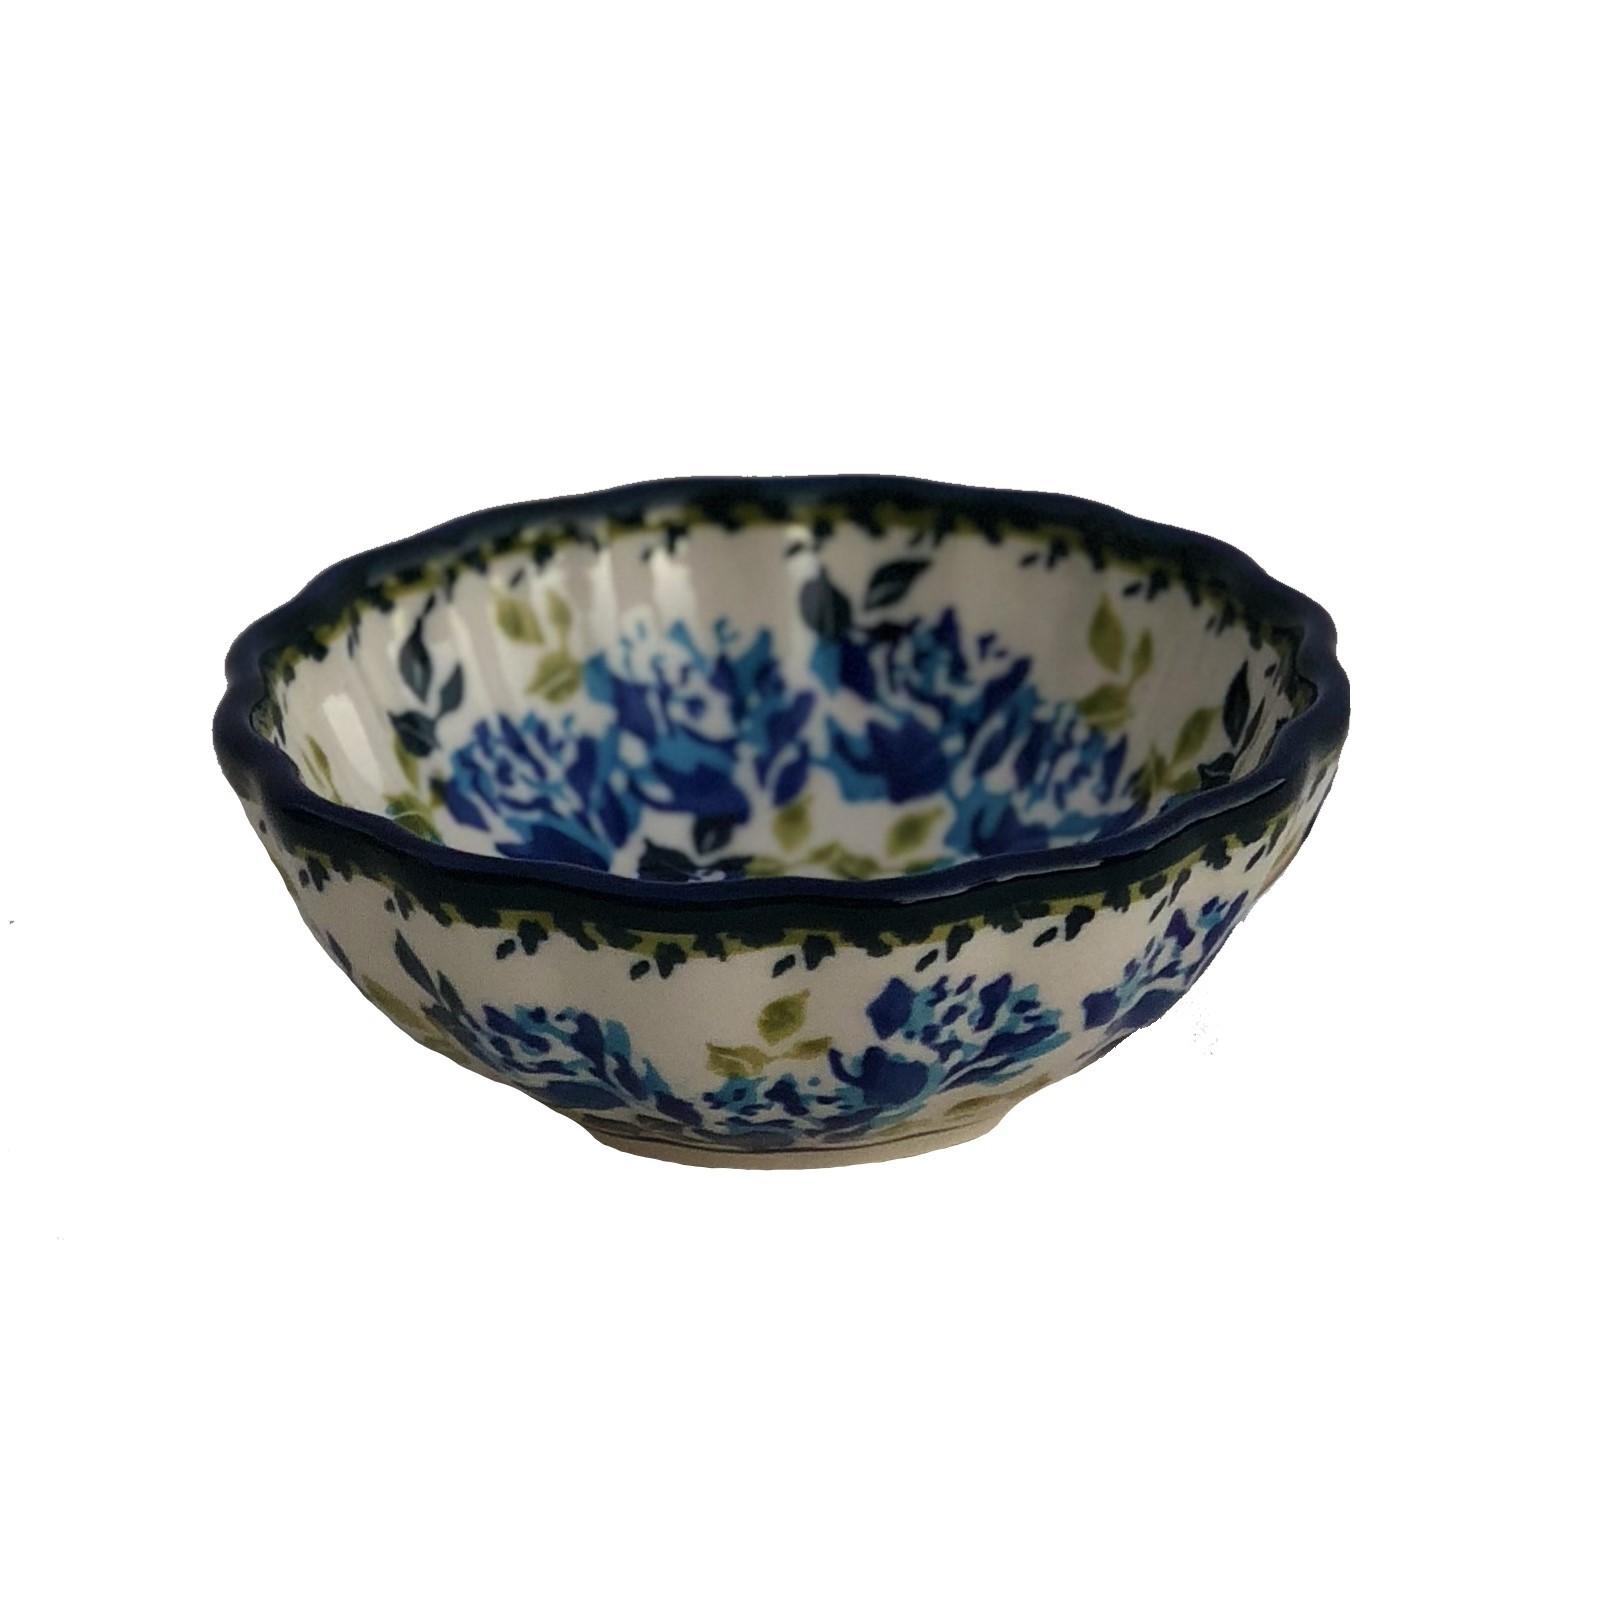 Pottery Avenue Small Scalloped Stoneware Bowl - 1518-DU208 Blue Flower